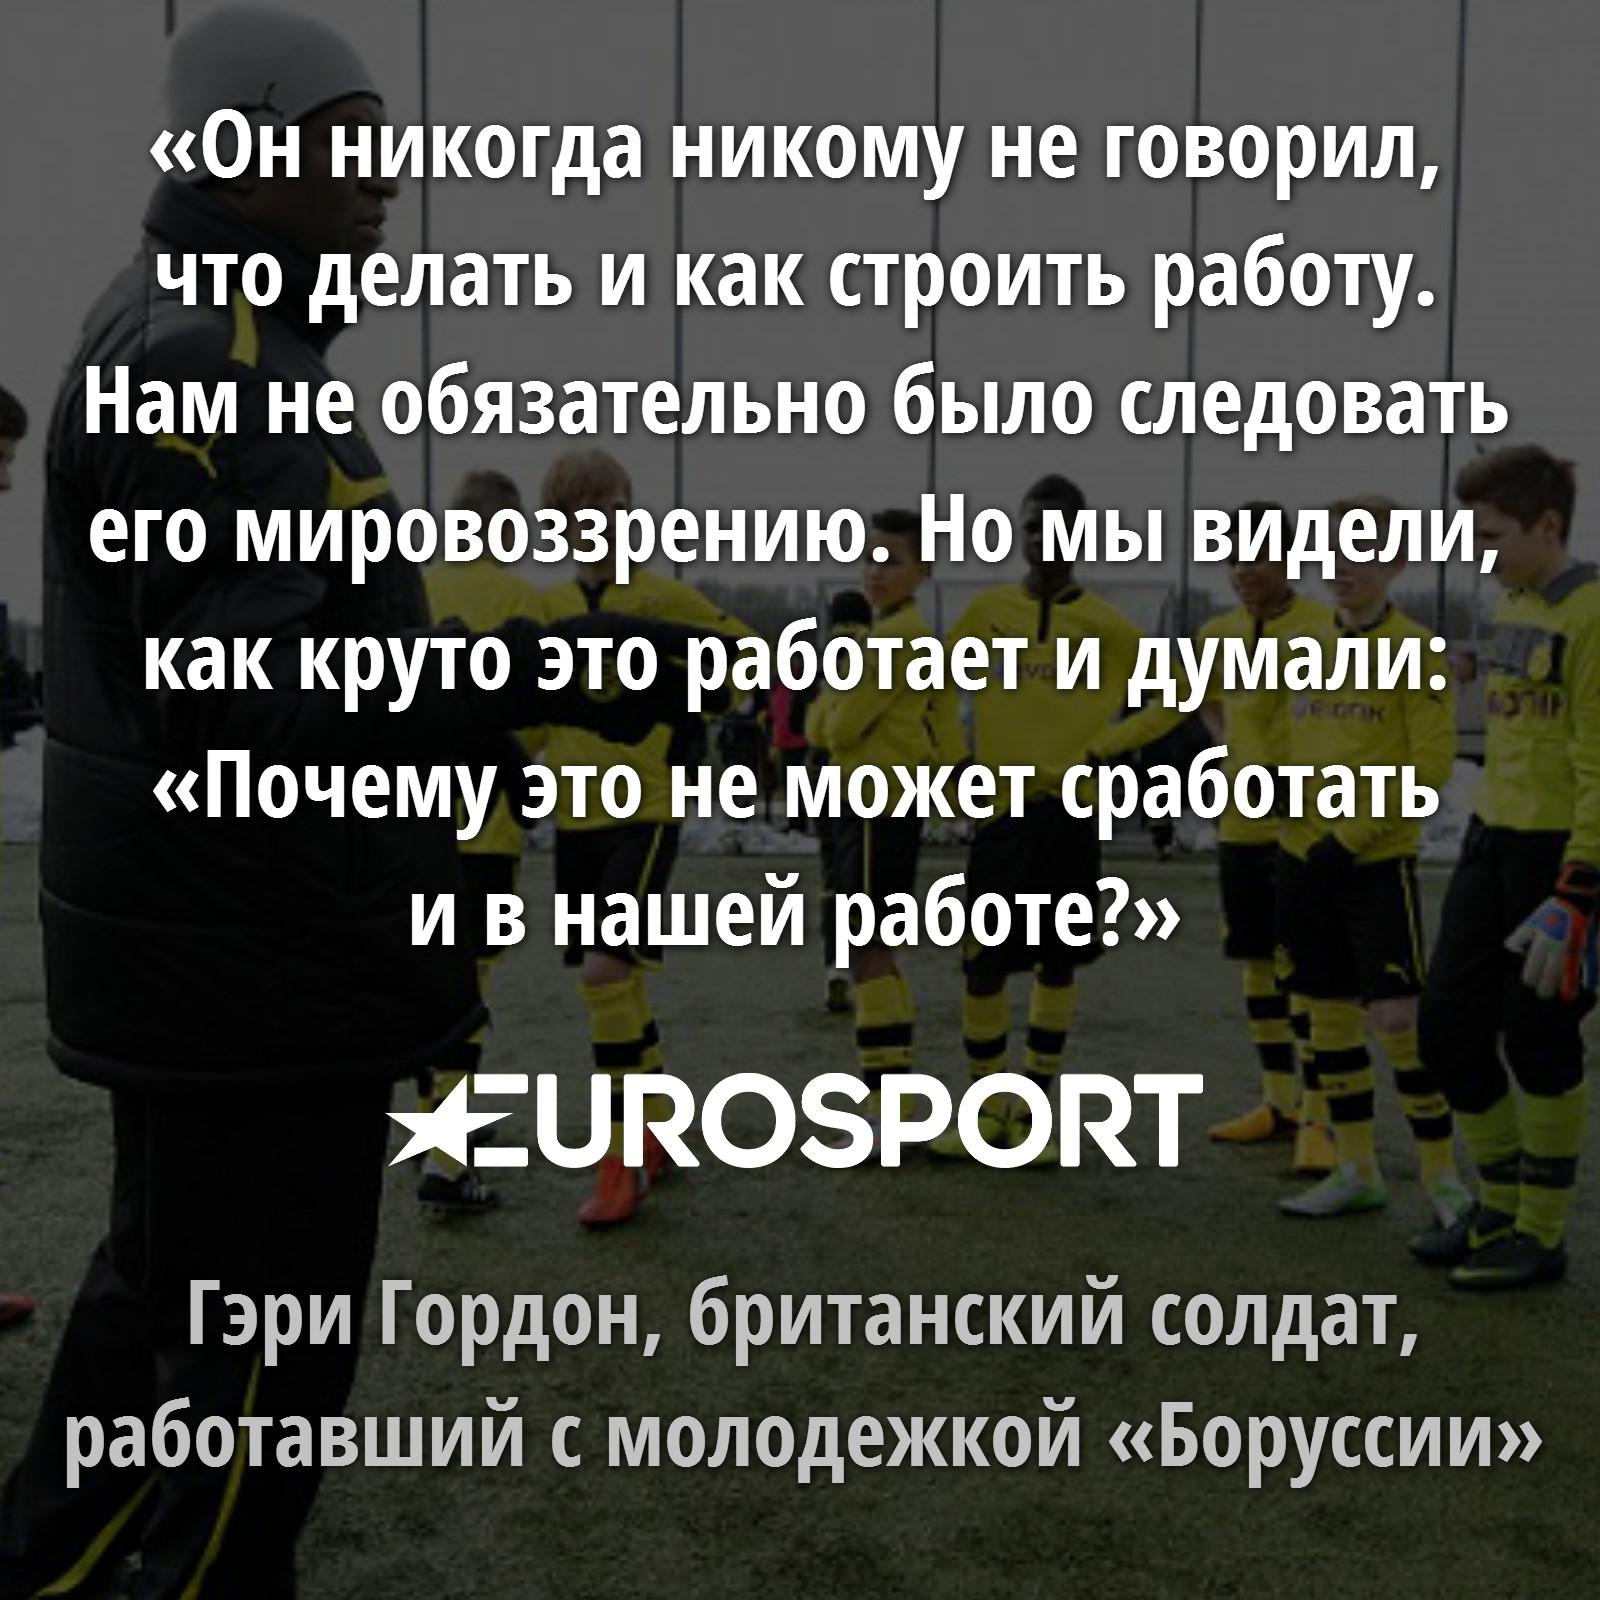 https://i.eurosport.com/2015/11/19/1735212.jpg